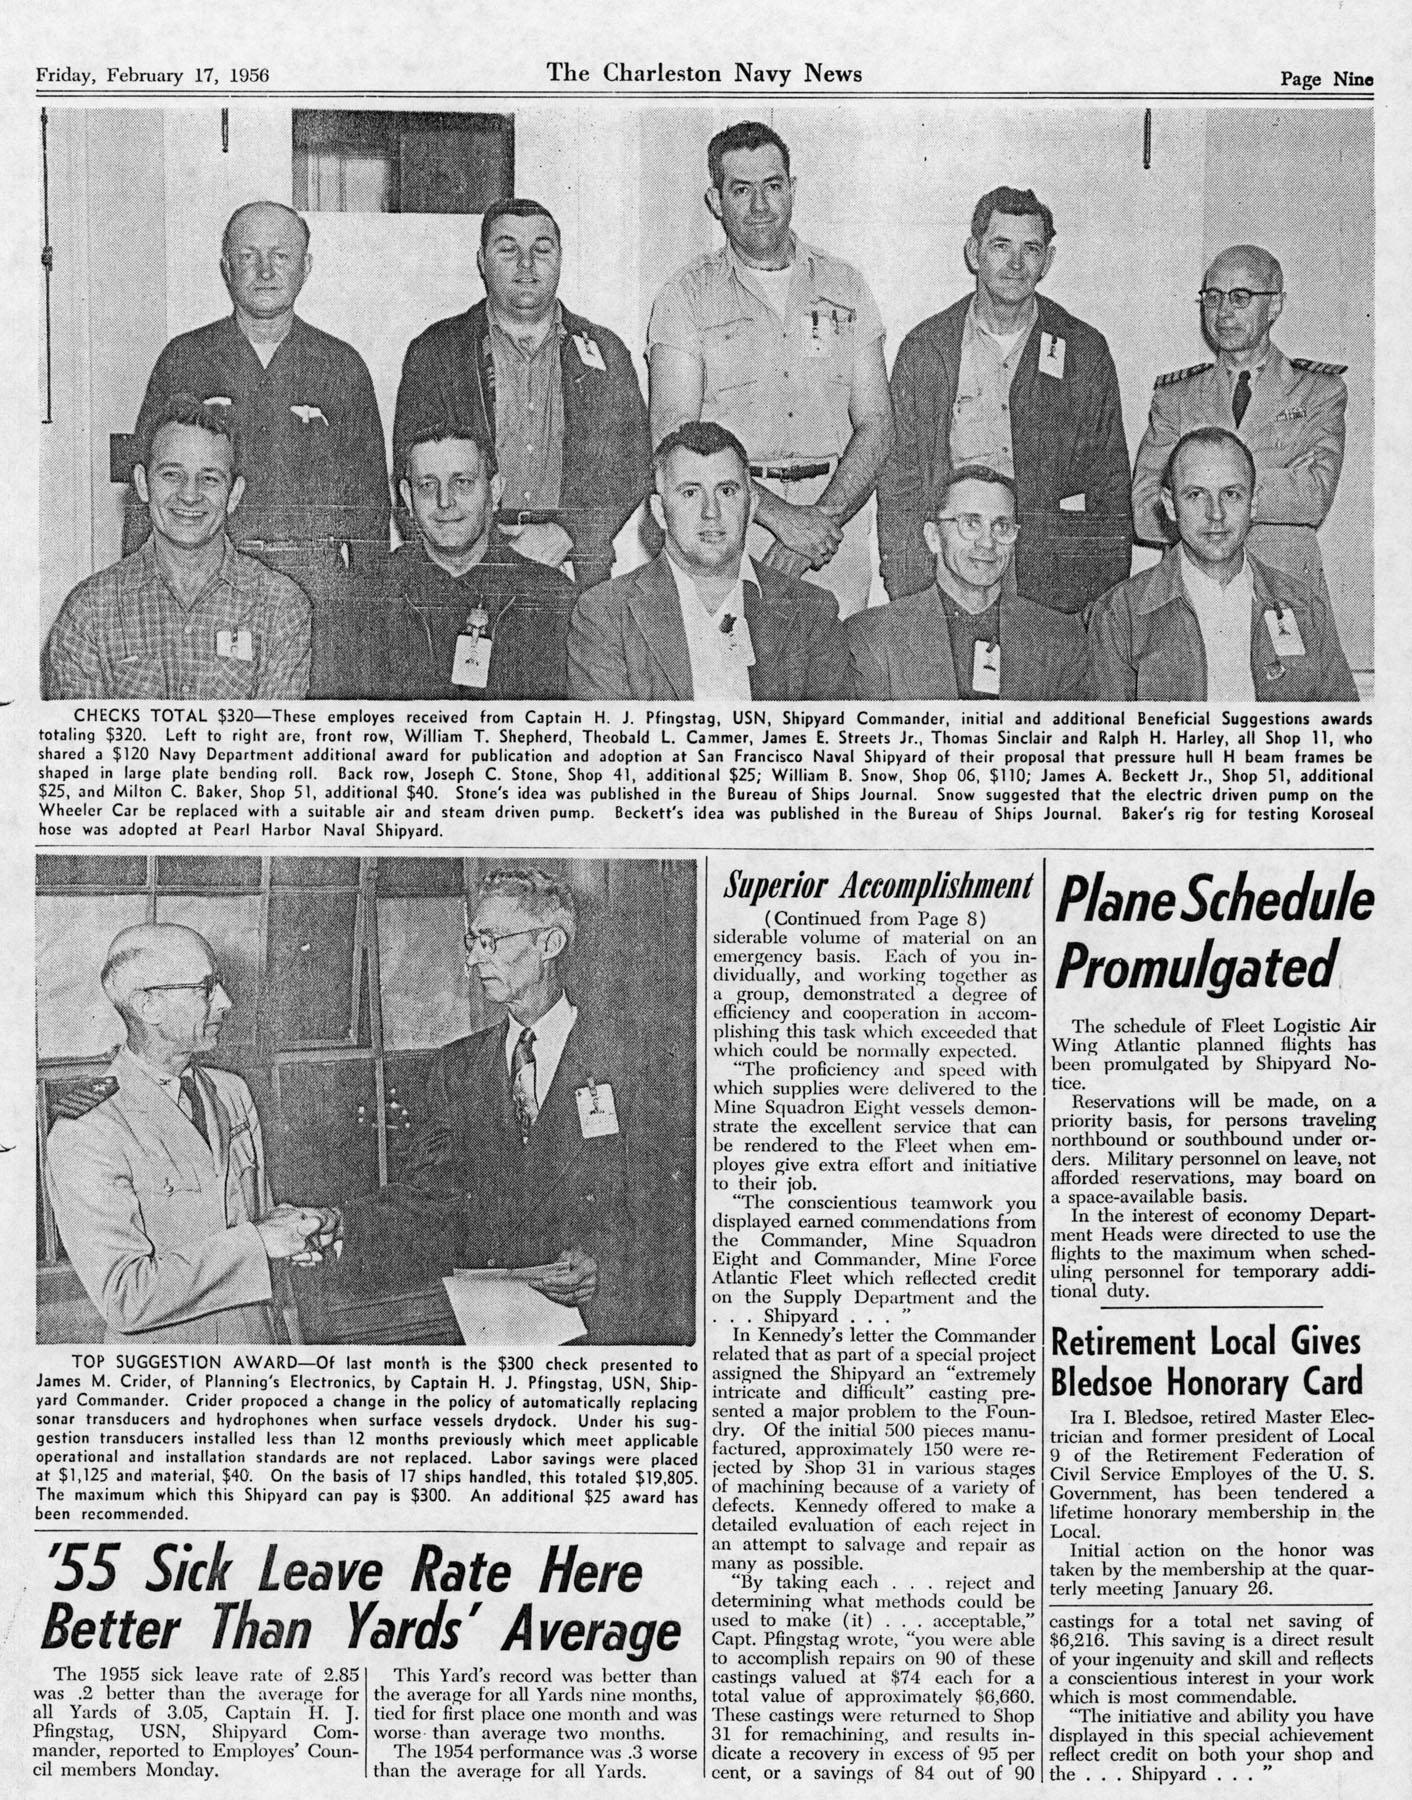 The Charleston Navy News, Volume 14, Edition 15, page ix